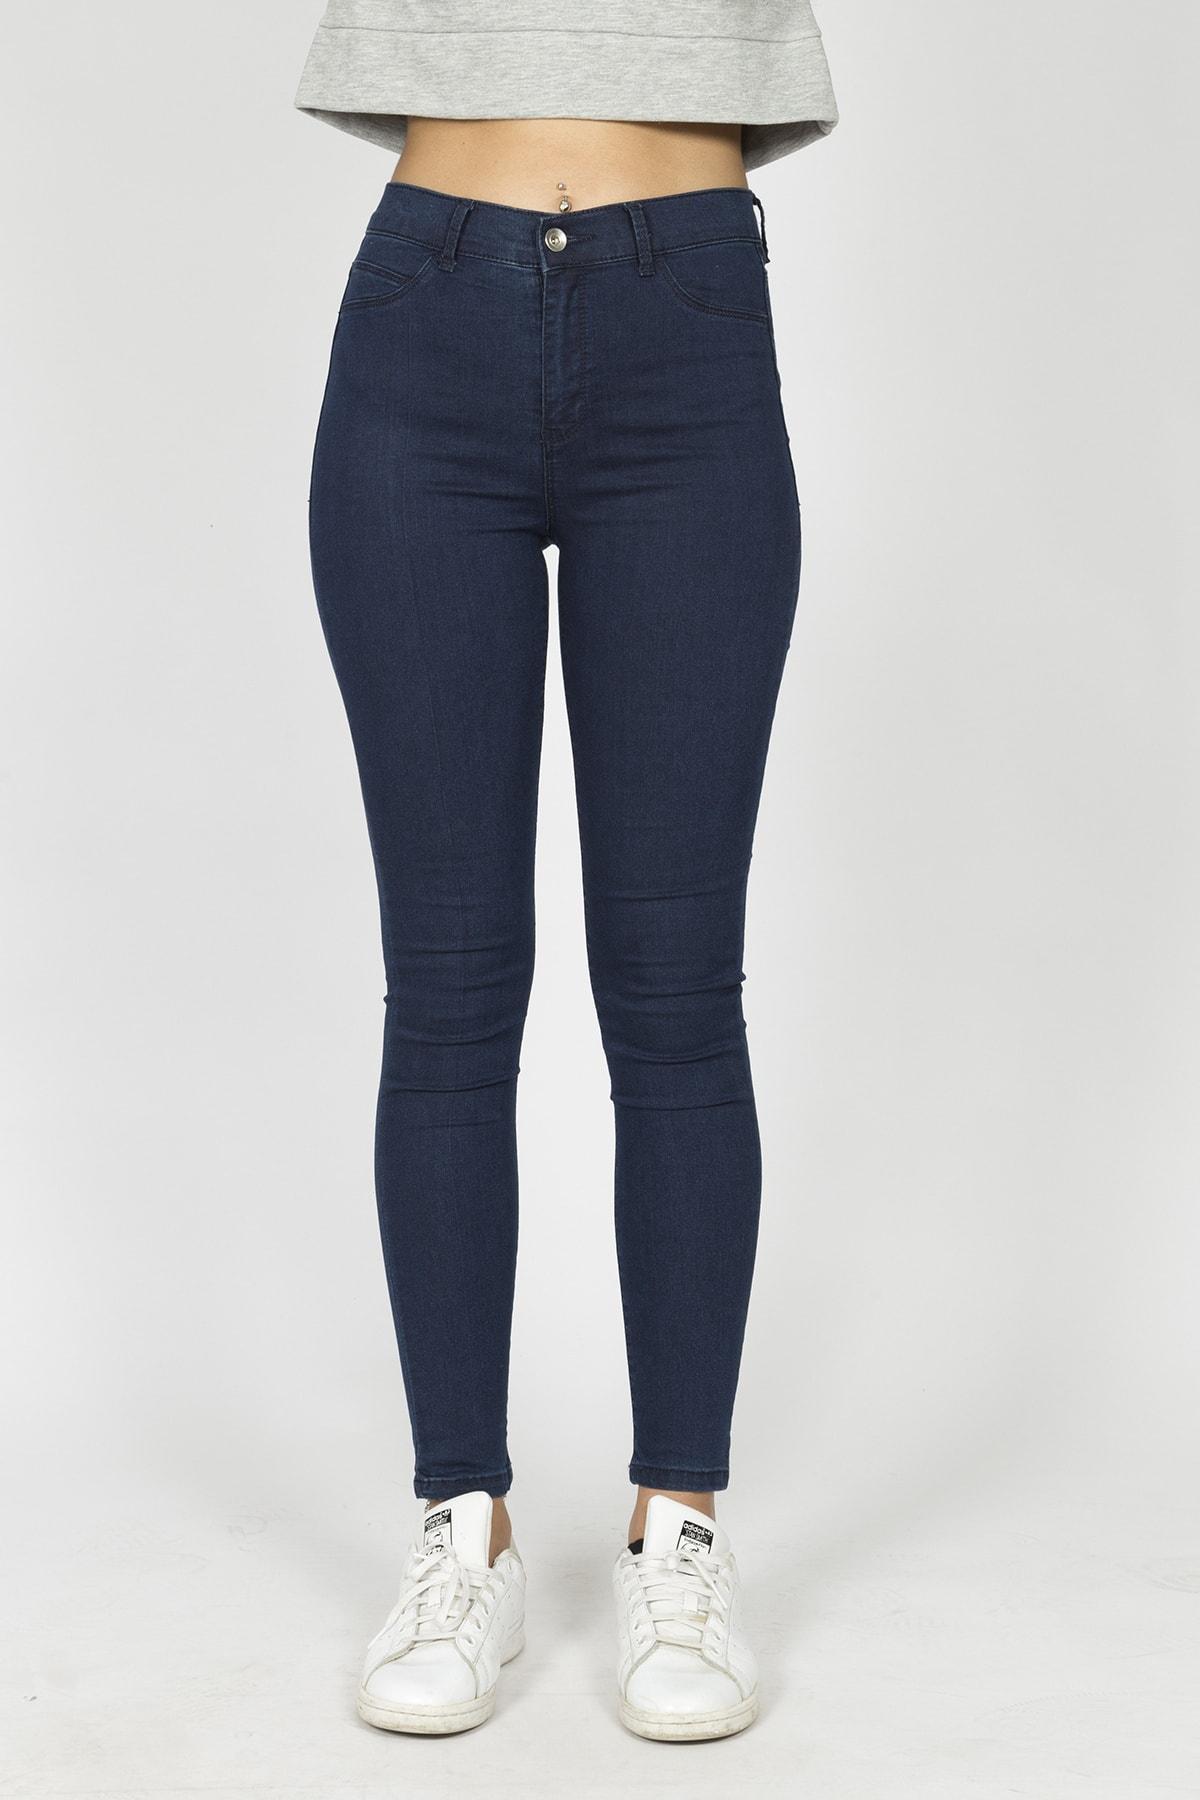 Berm Collection Kadın Lacivert Jeans Kot Pantolon 1